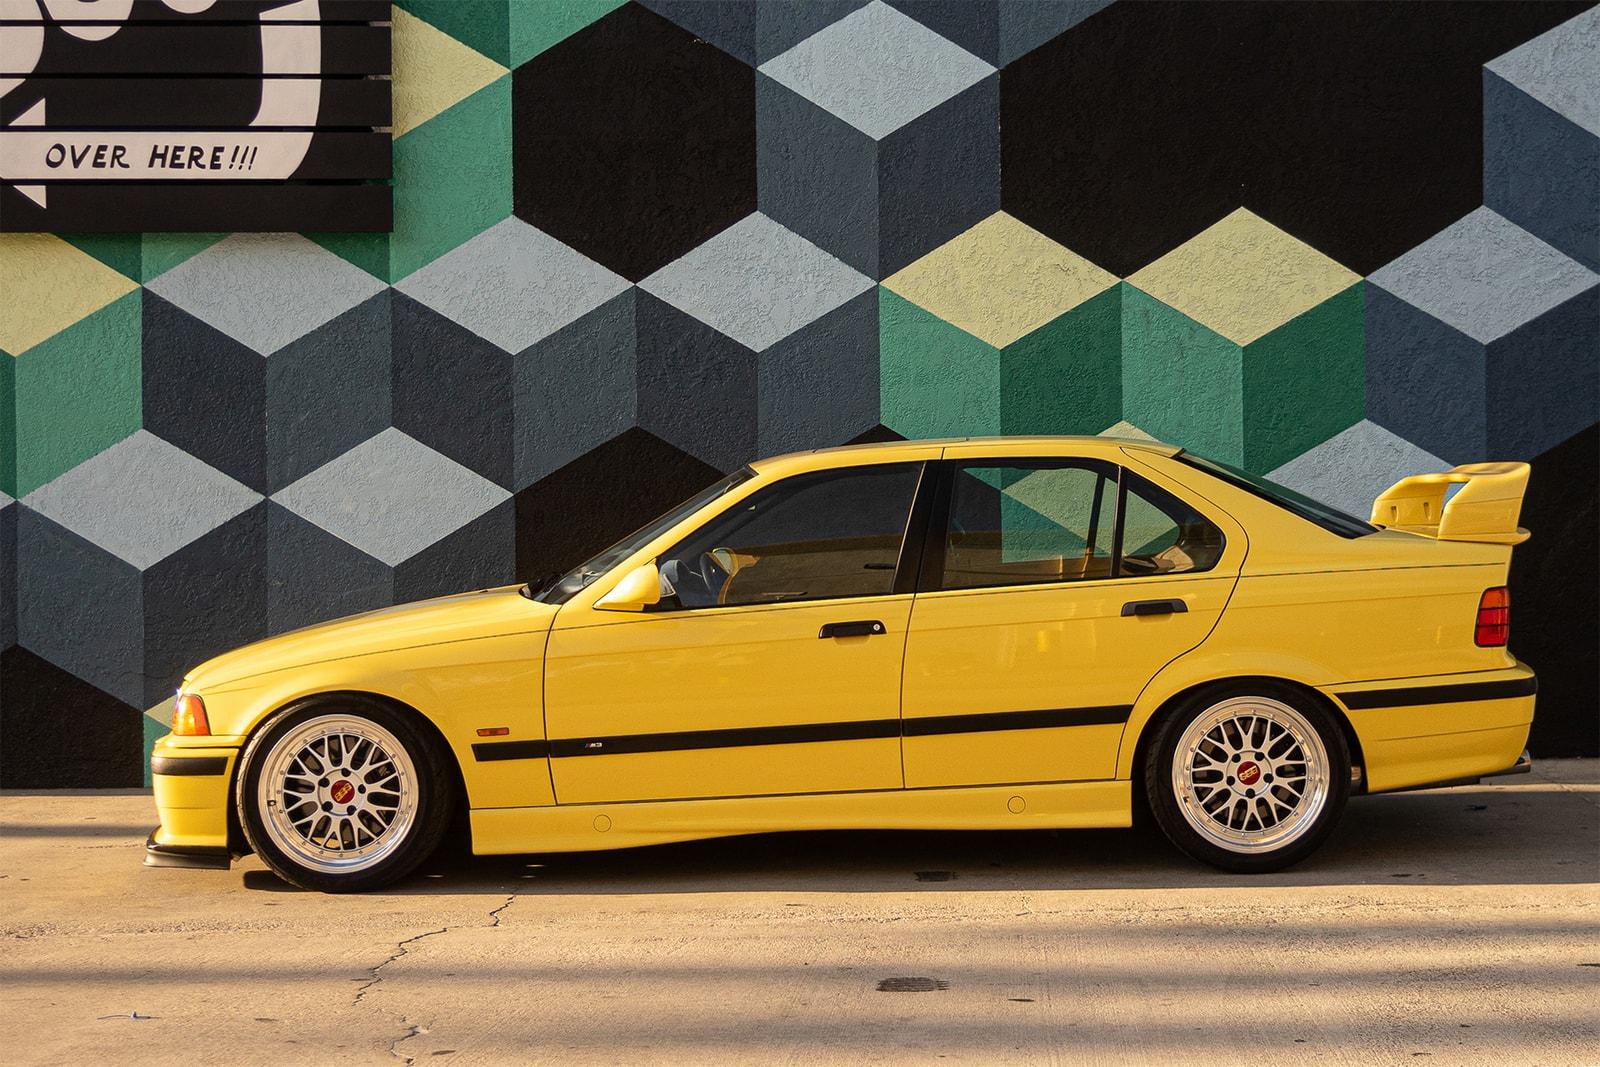 Nick Sisombath of Collegium and His BMW M3 E36 Drivers HYPEBEAST Car Club Dakar Yellow 3/4/5 Rare